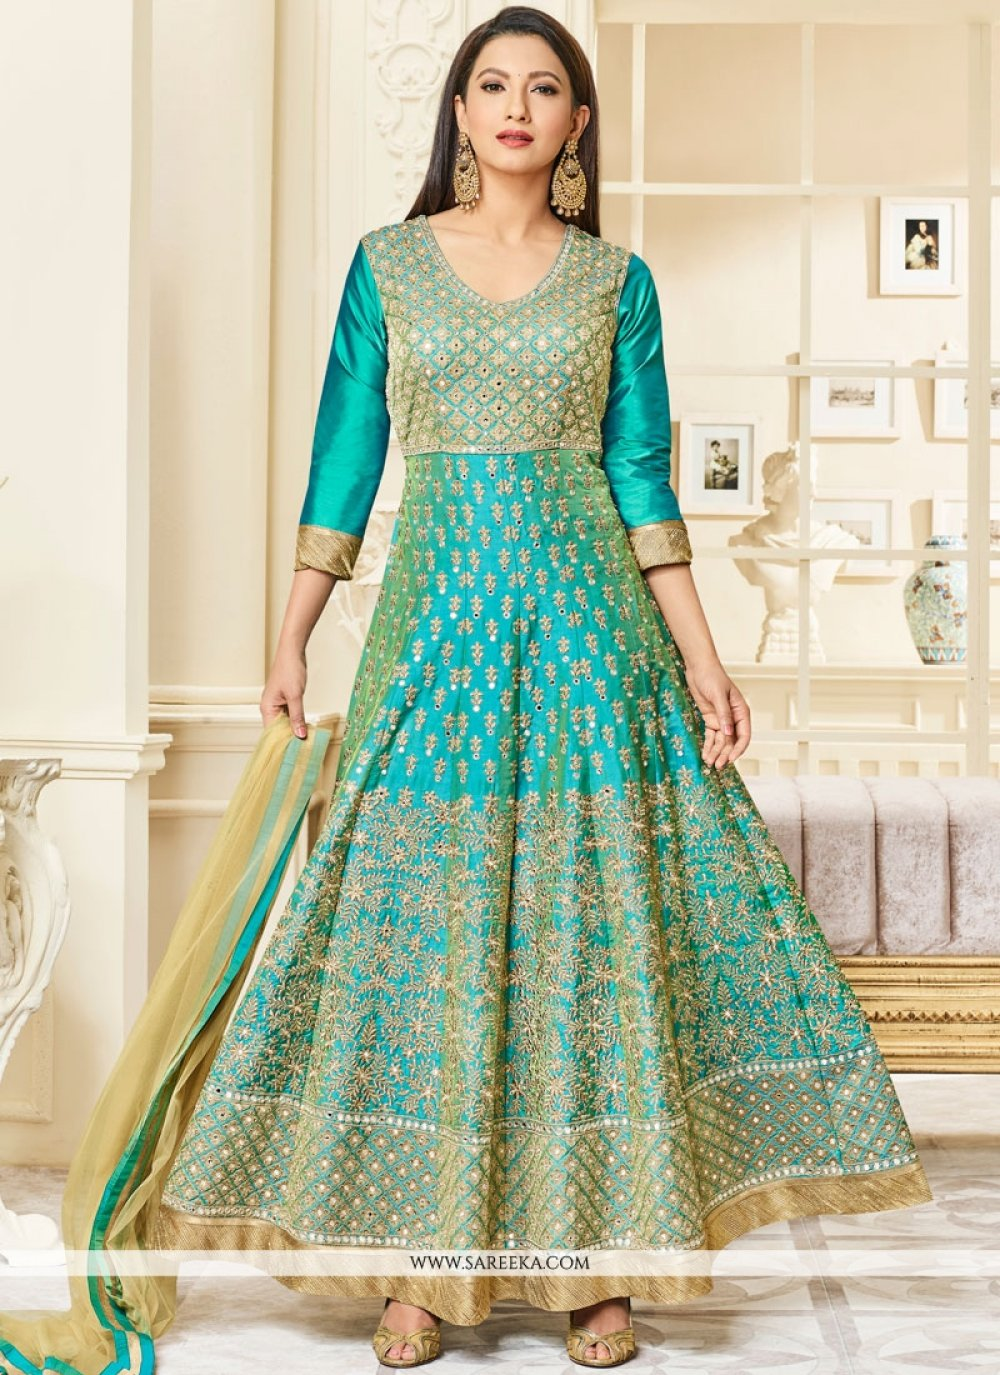 Gauhar Khan Sea Green Floor Length Anarkali Suit